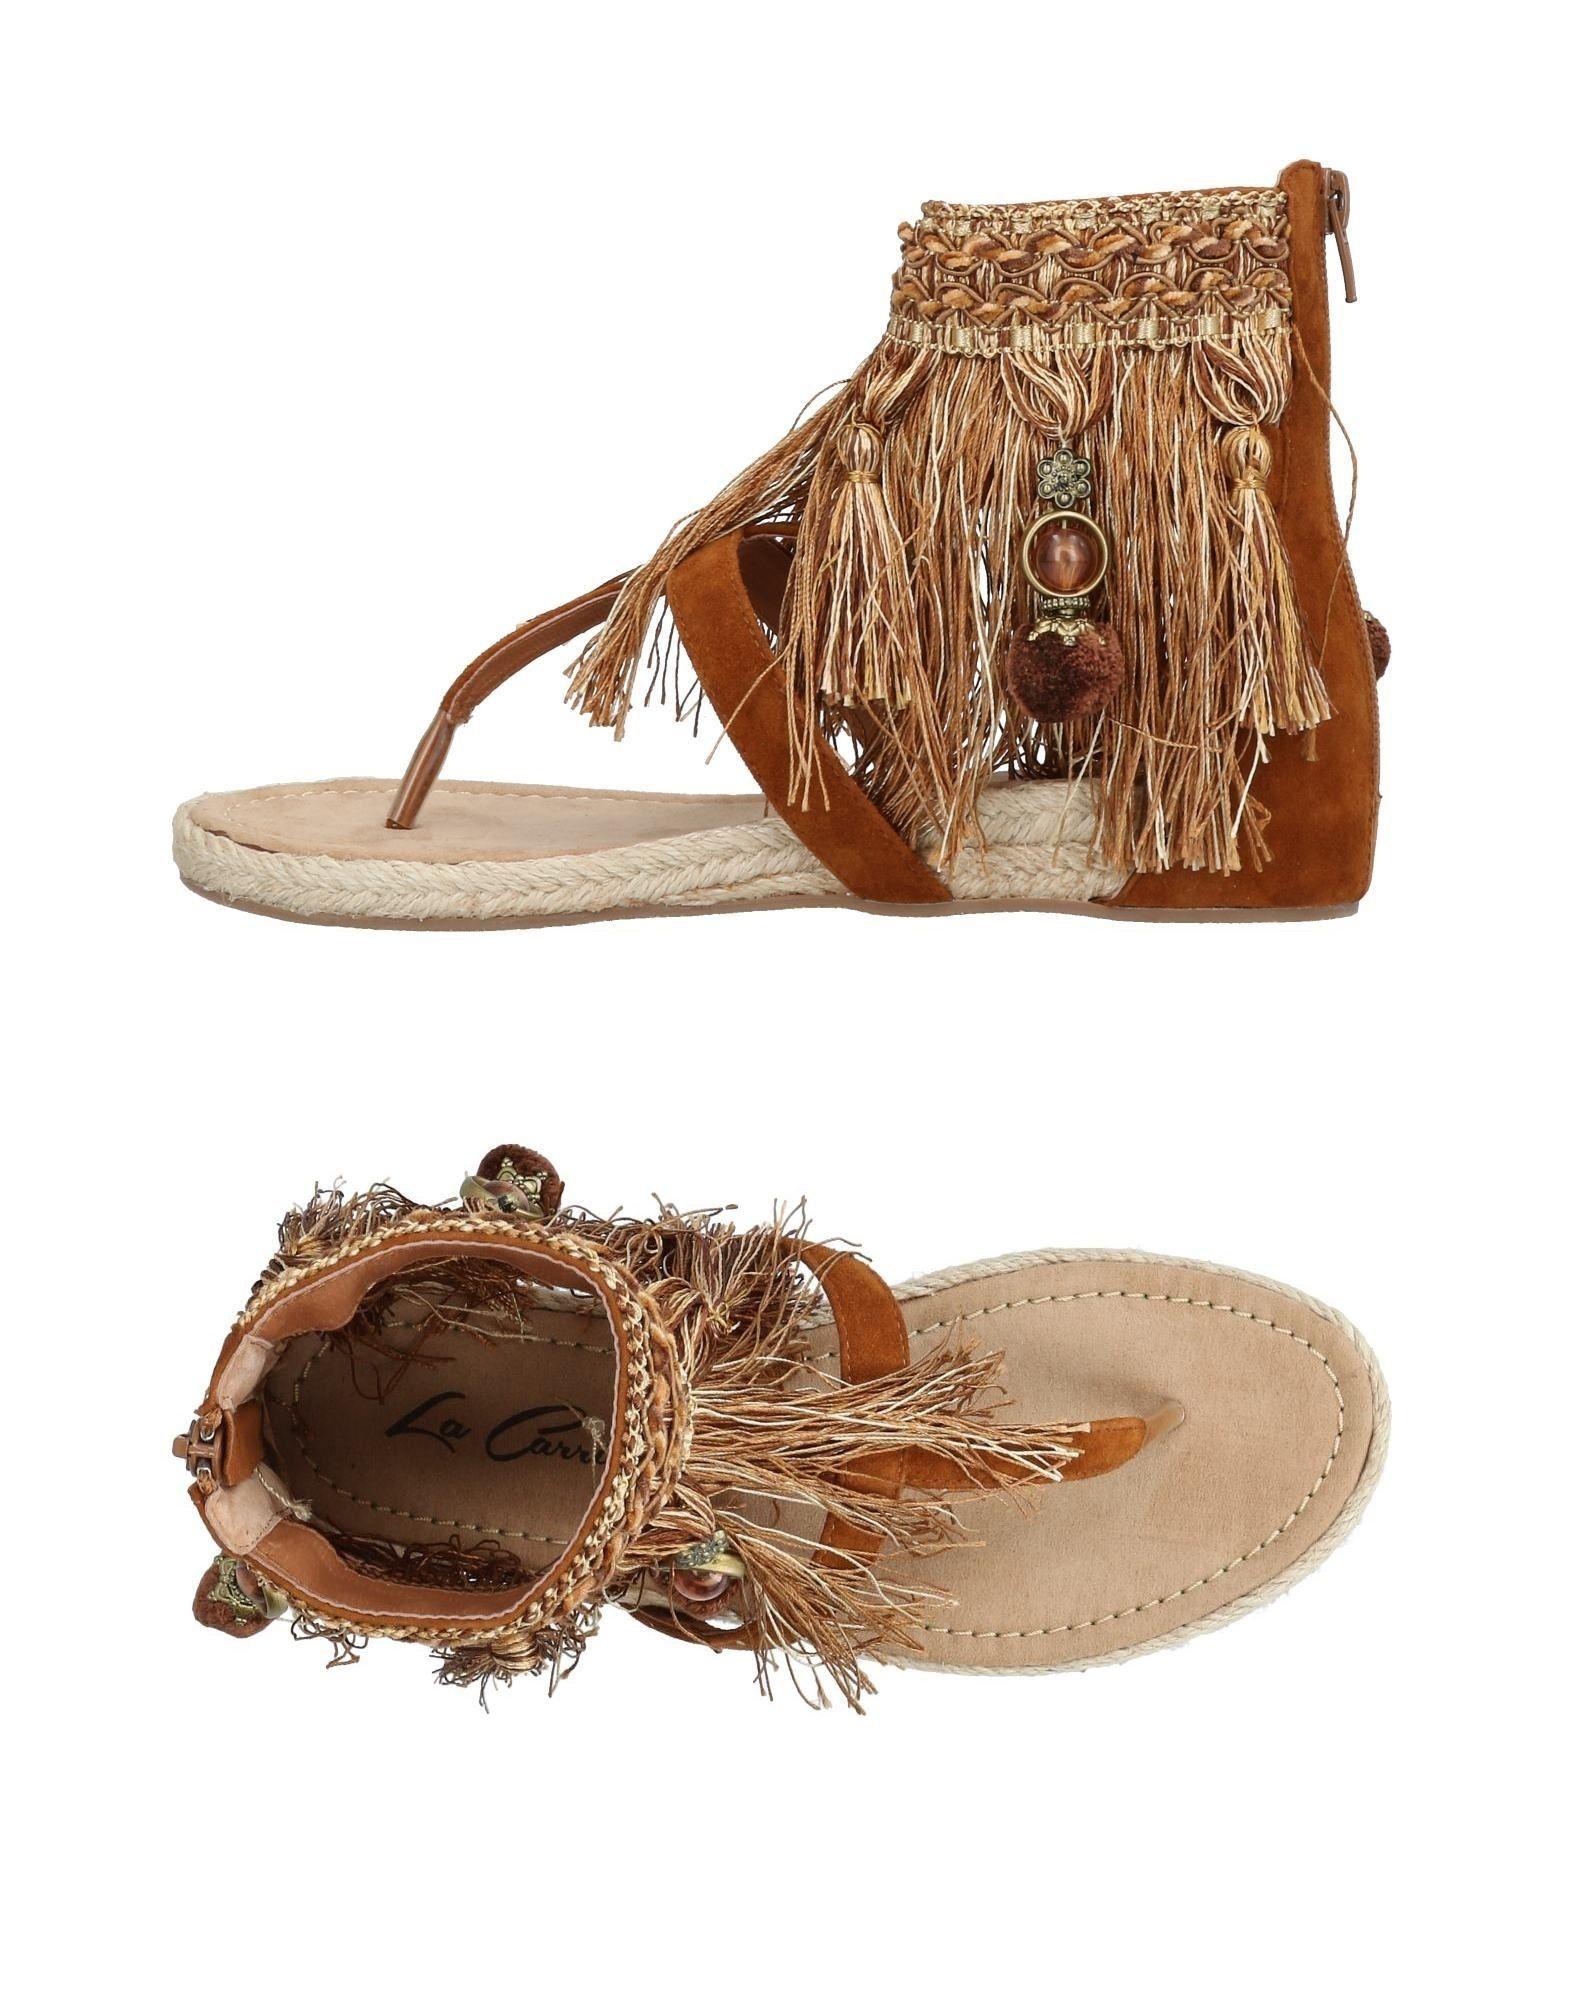 La Carrie Dianetten Damen  11426807HB Gute Qualität beliebte Schuhe